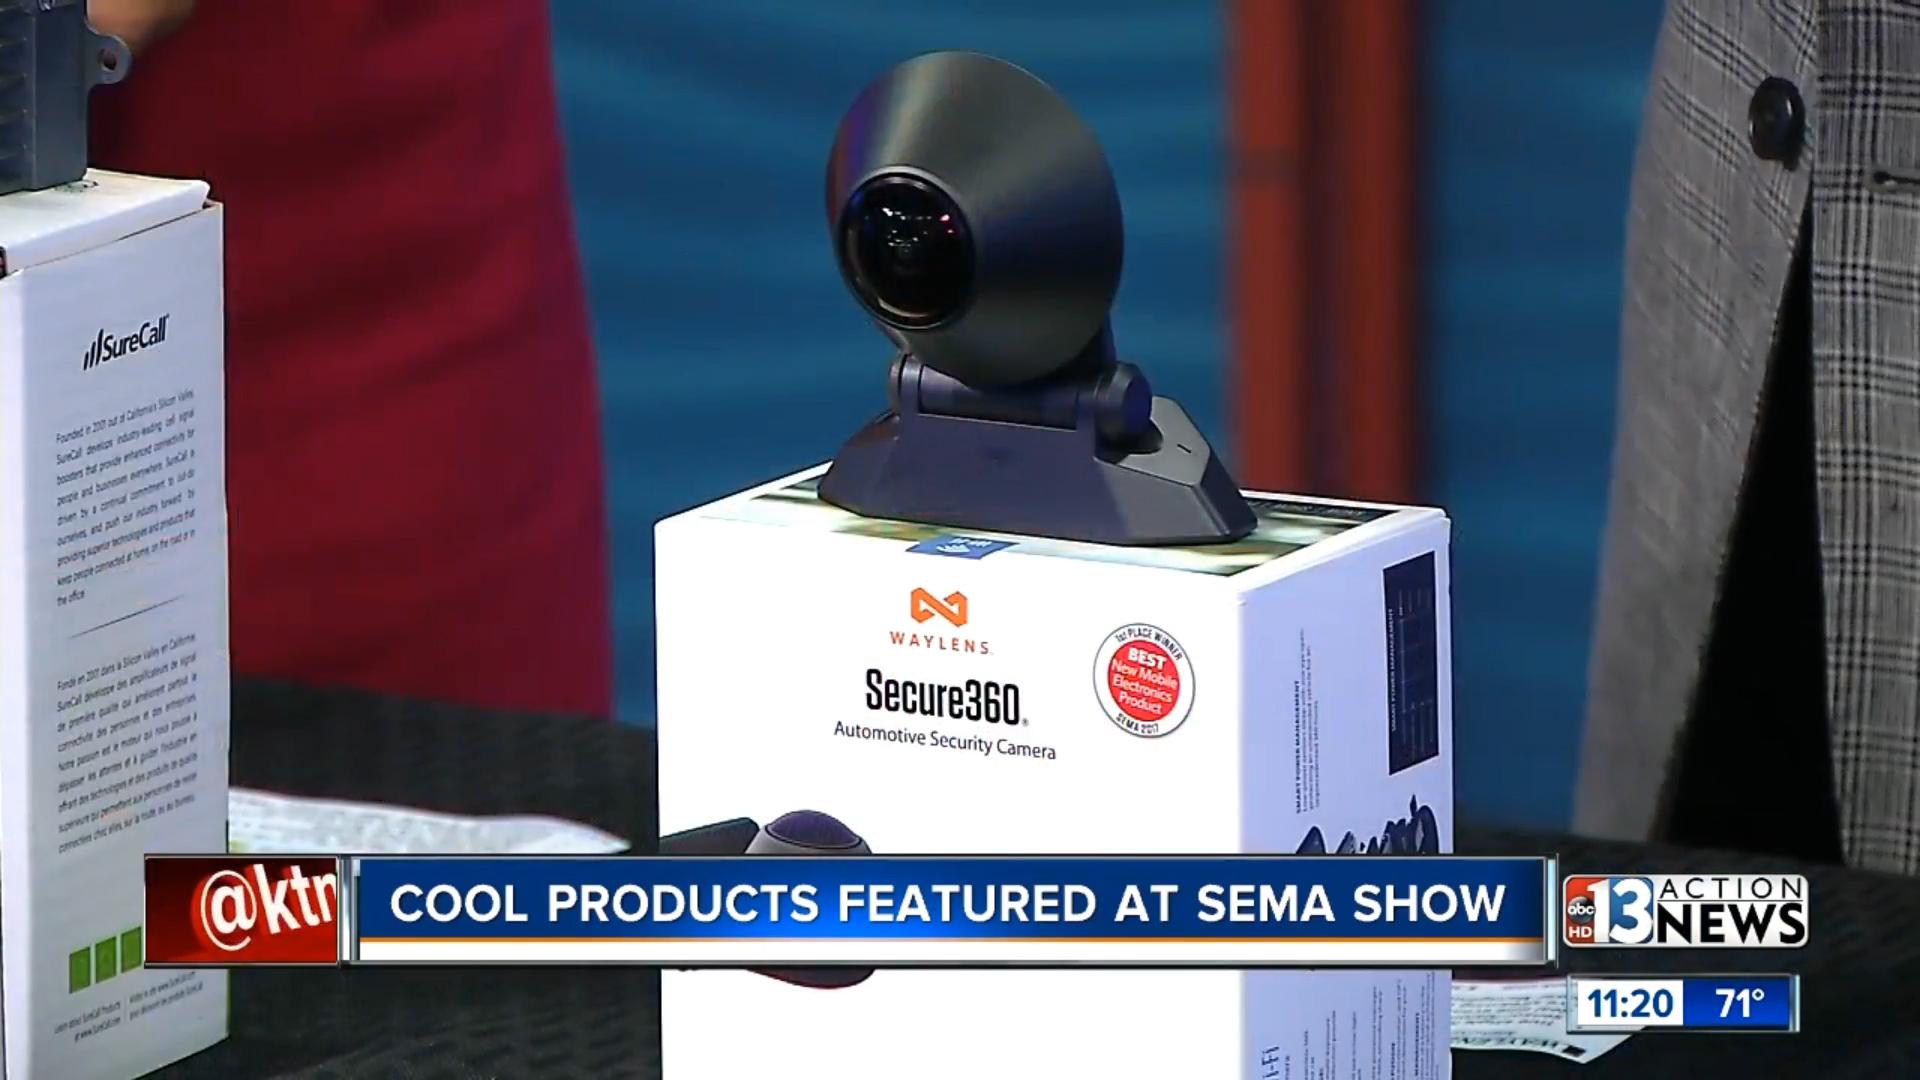 WAYLENS SECURE 360 AUTOMOTIVE SECURITY CAMERA - $399.99Shop Now